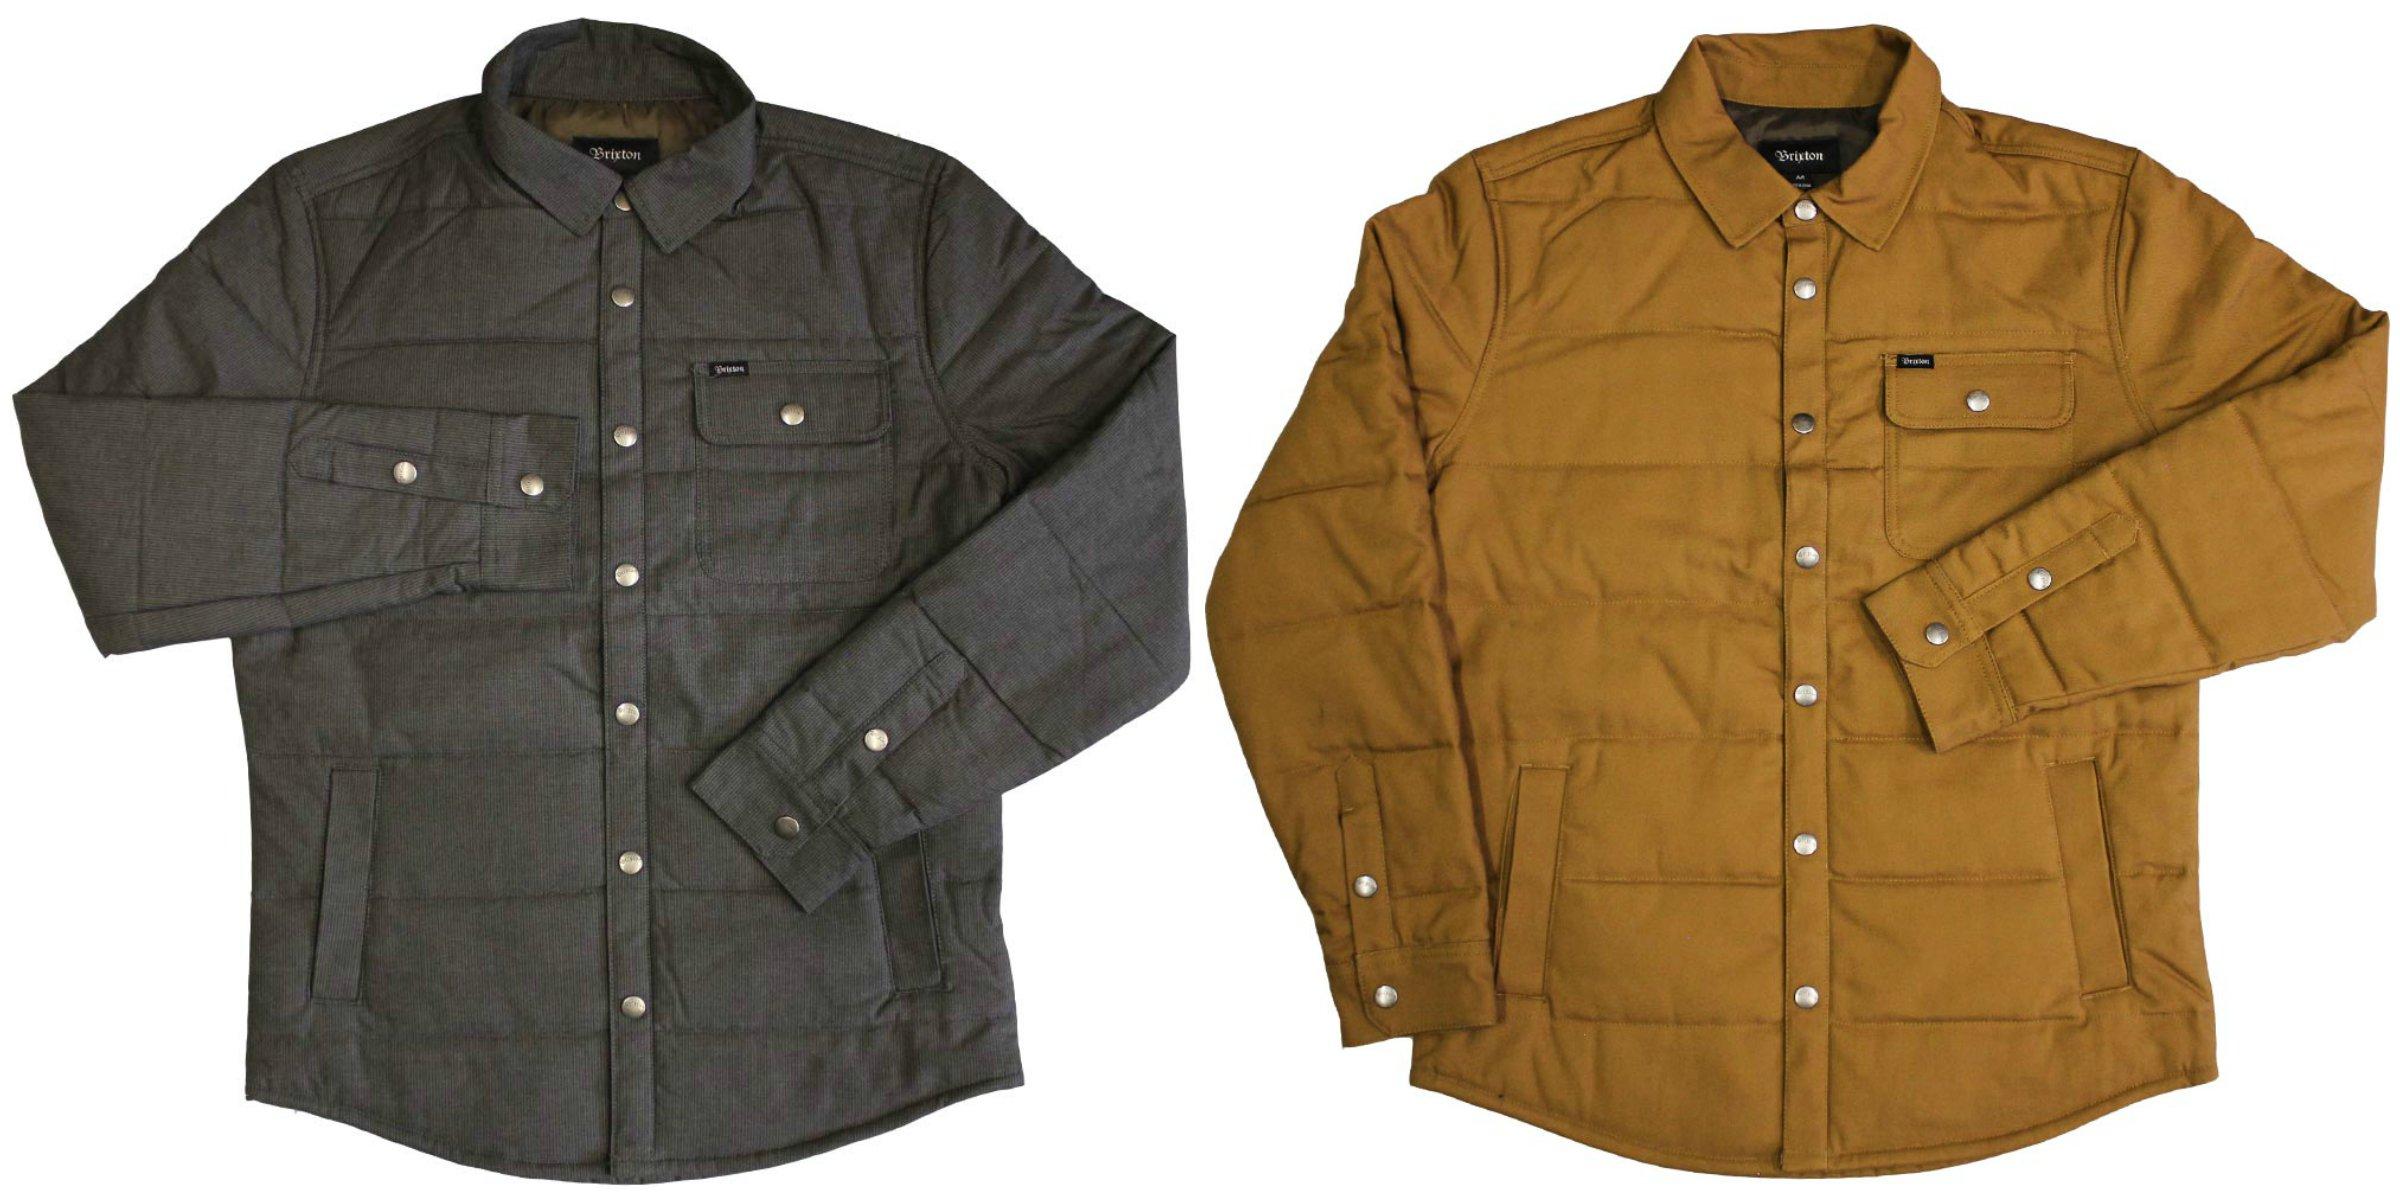 Brixton Ltd Cass Jacket, (Dark grey) £99.99 (Copper) £94.99